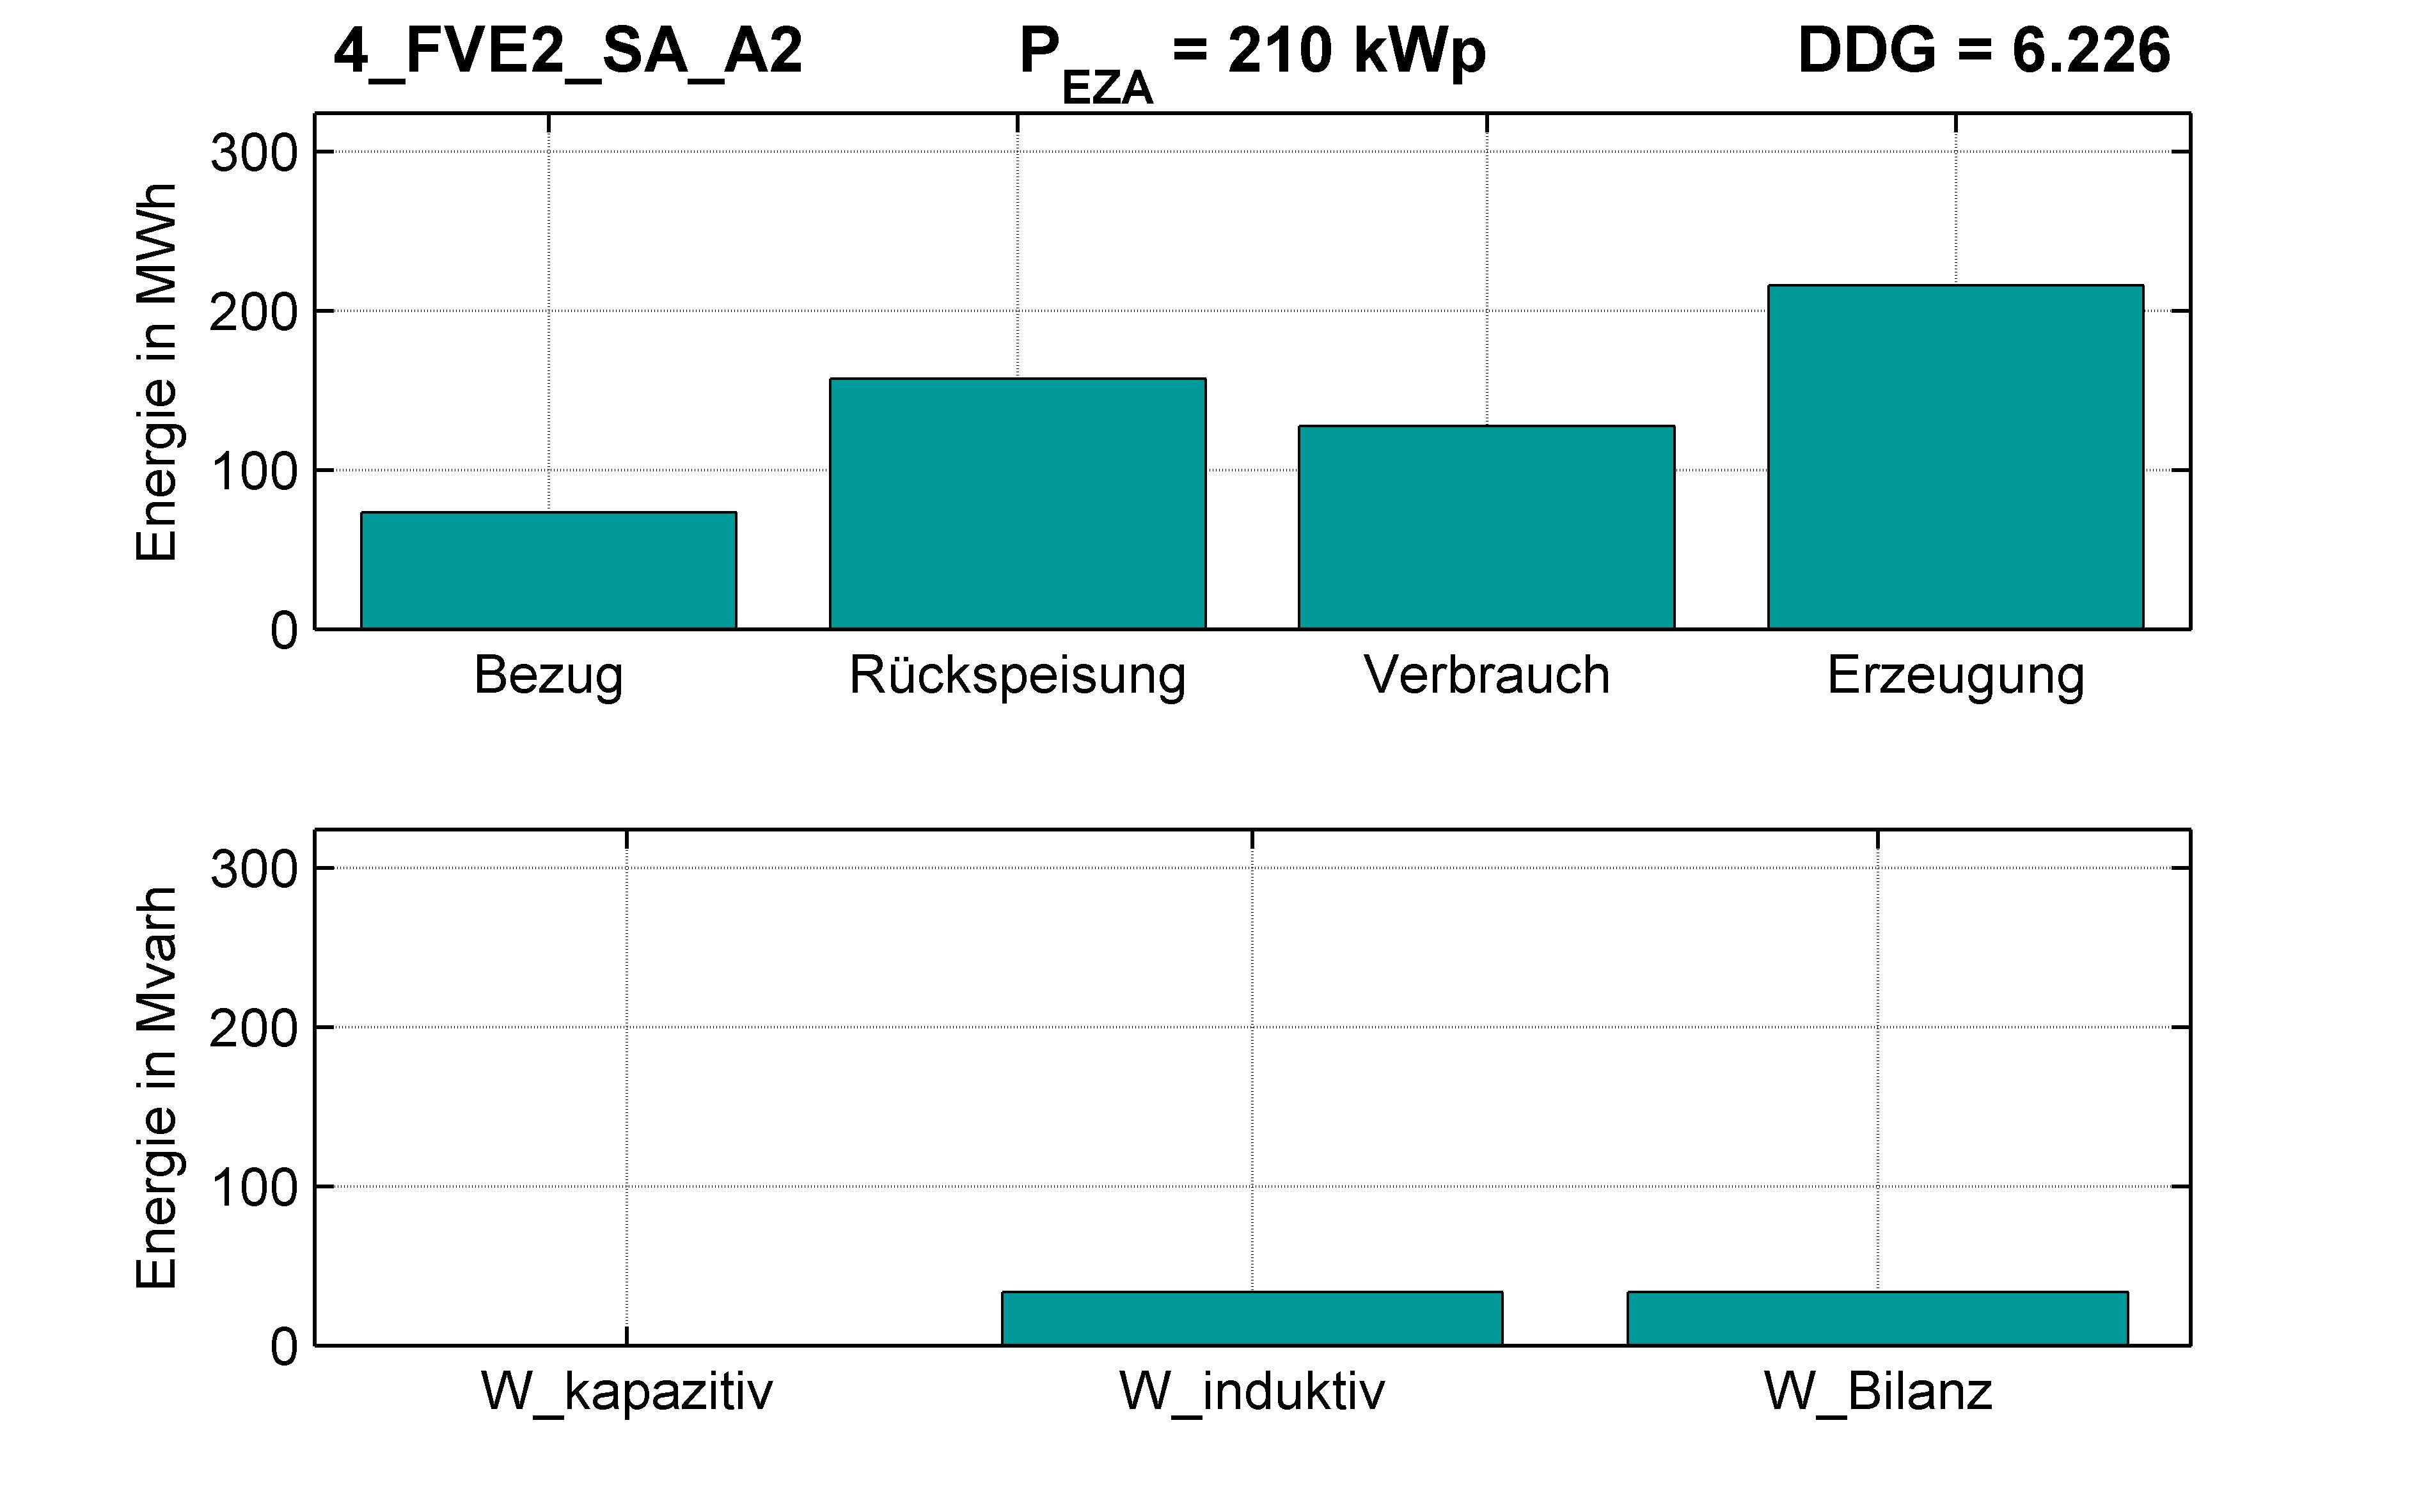 FVE2 | P-Kappung 55% (SA) A2 | PQ-Bilanz